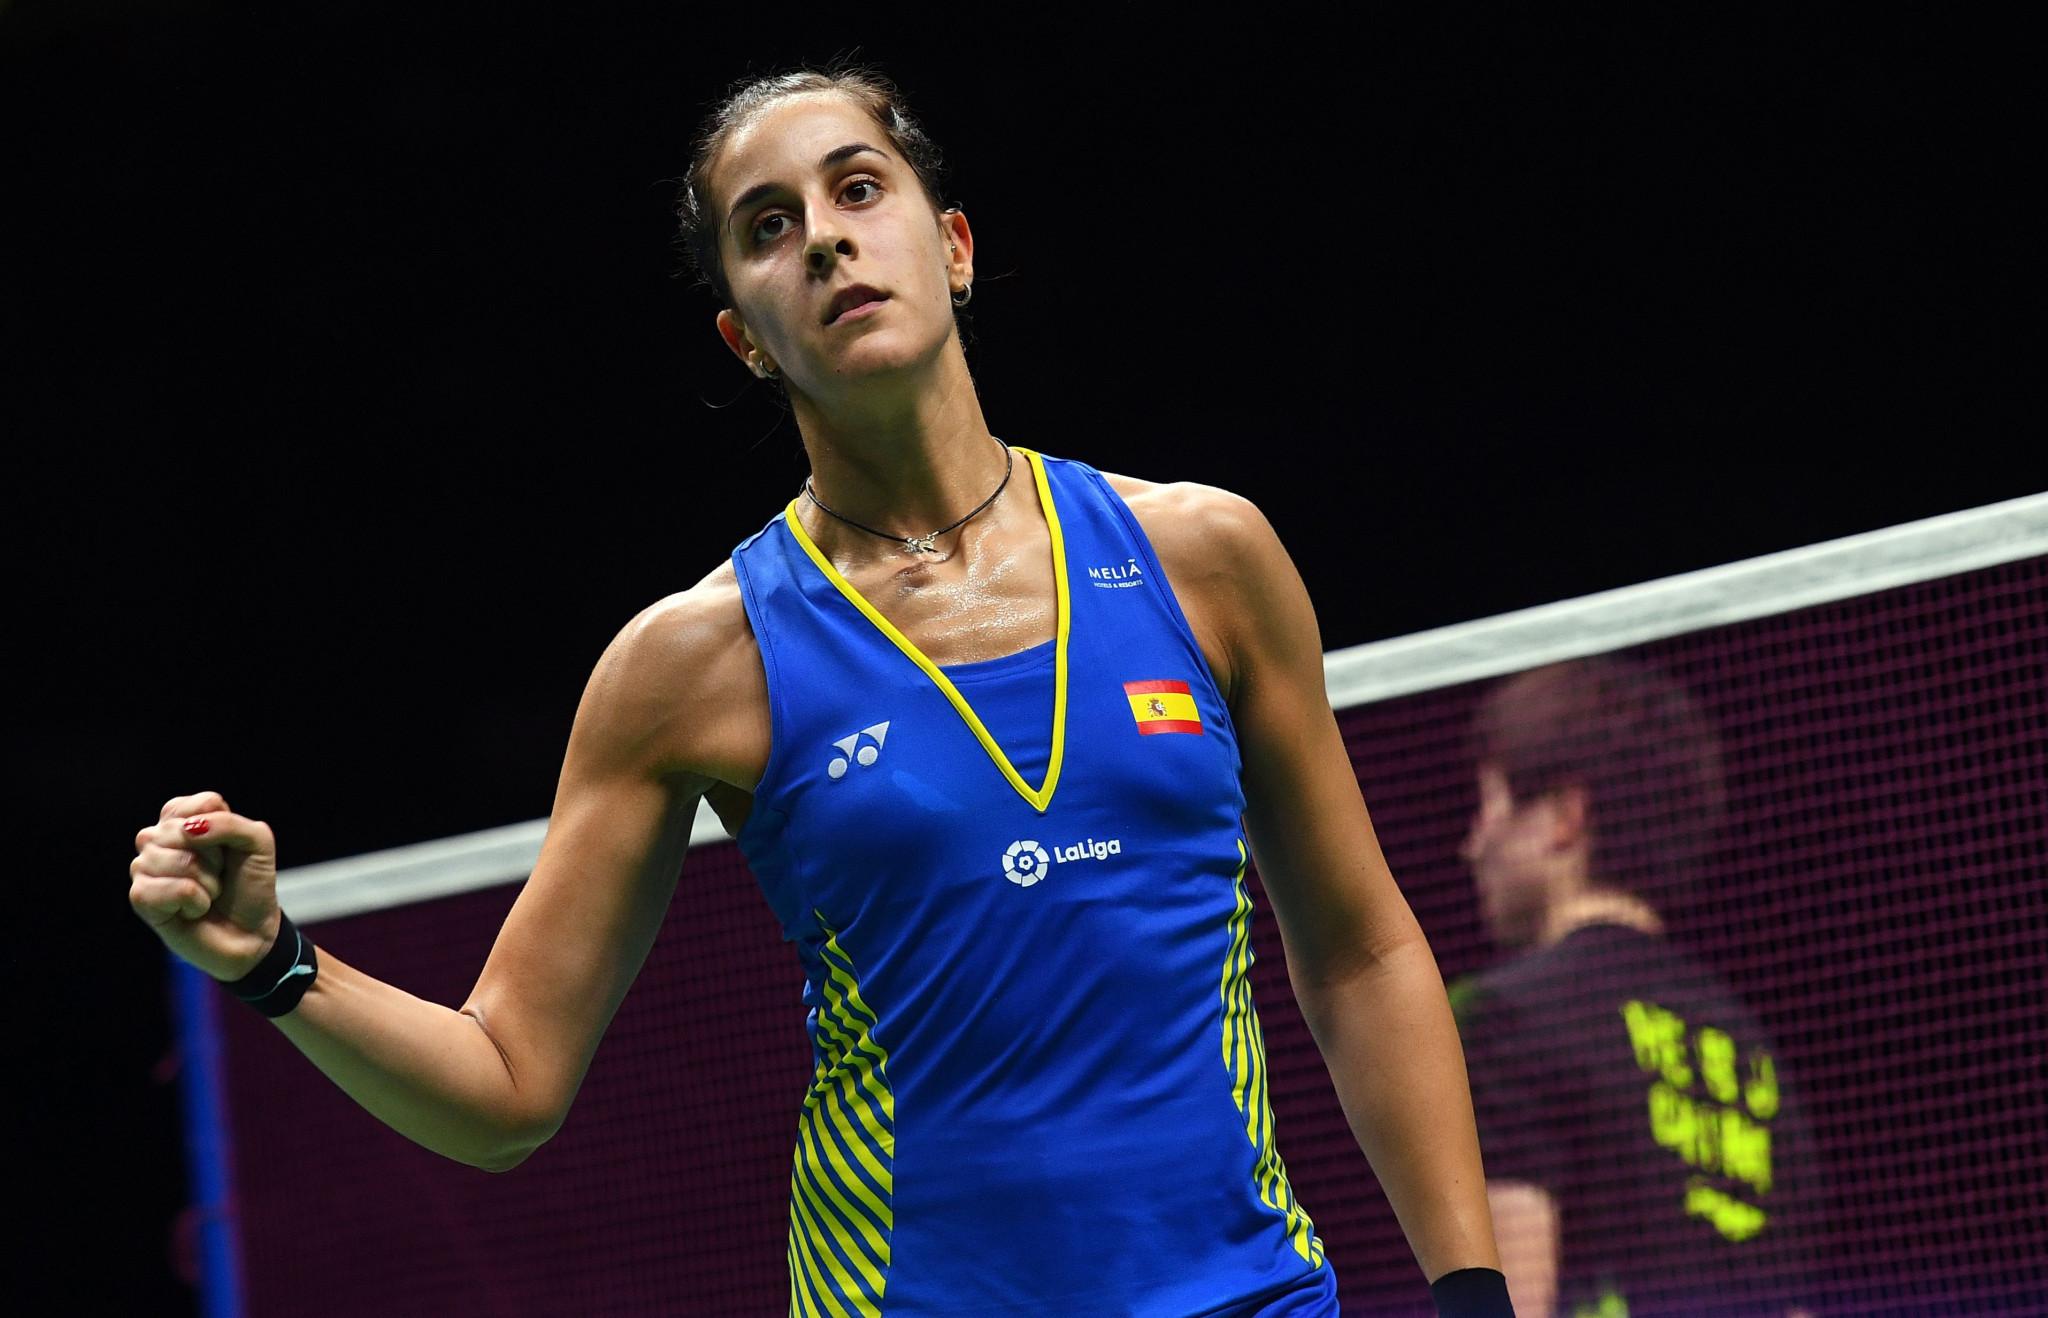 Marin and Shi among semi-final winners at Badminton World Championships